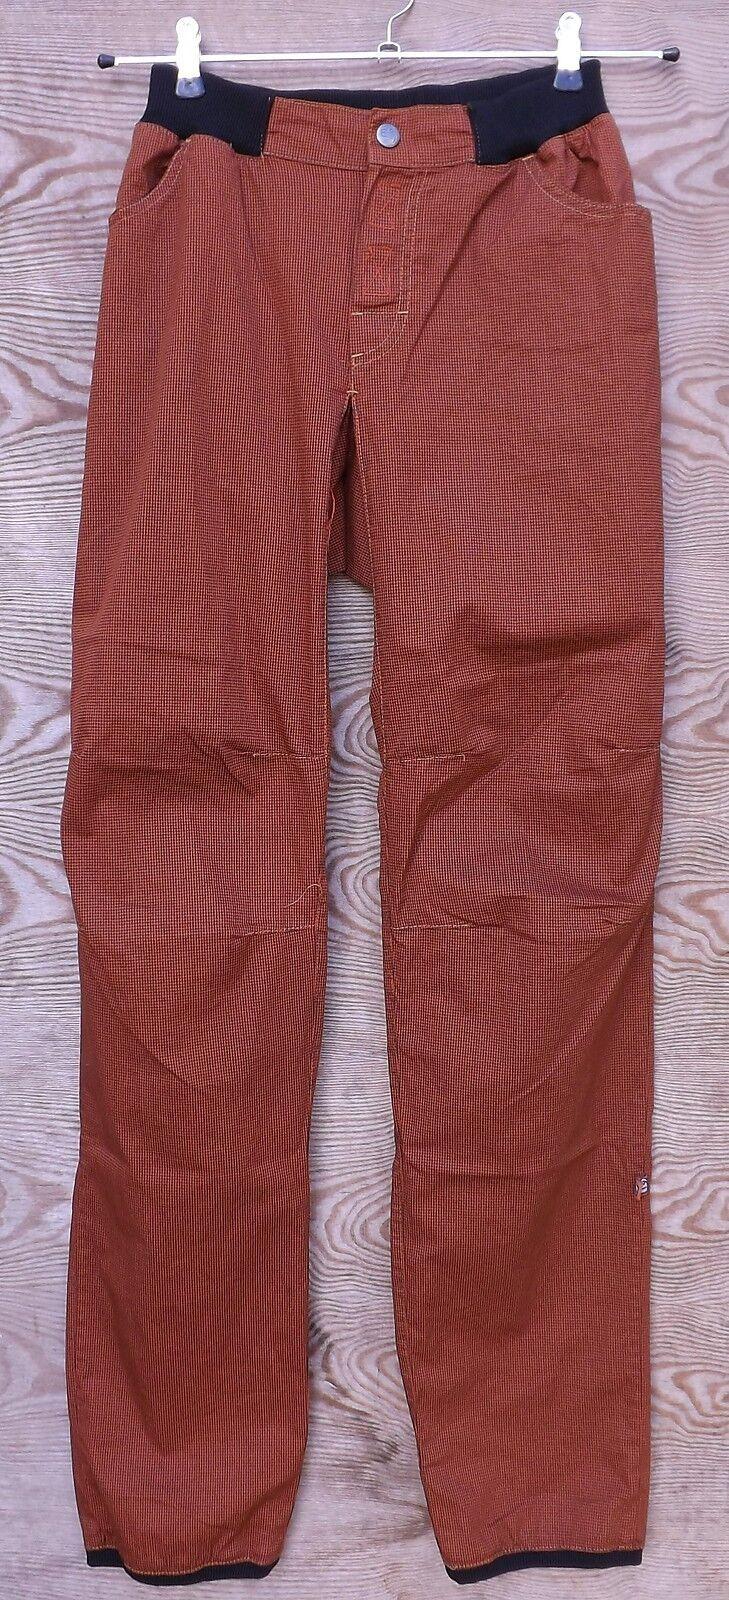 E9 Ligero Pantalones Para Escalar mon-10, NUEVO, ladrillo